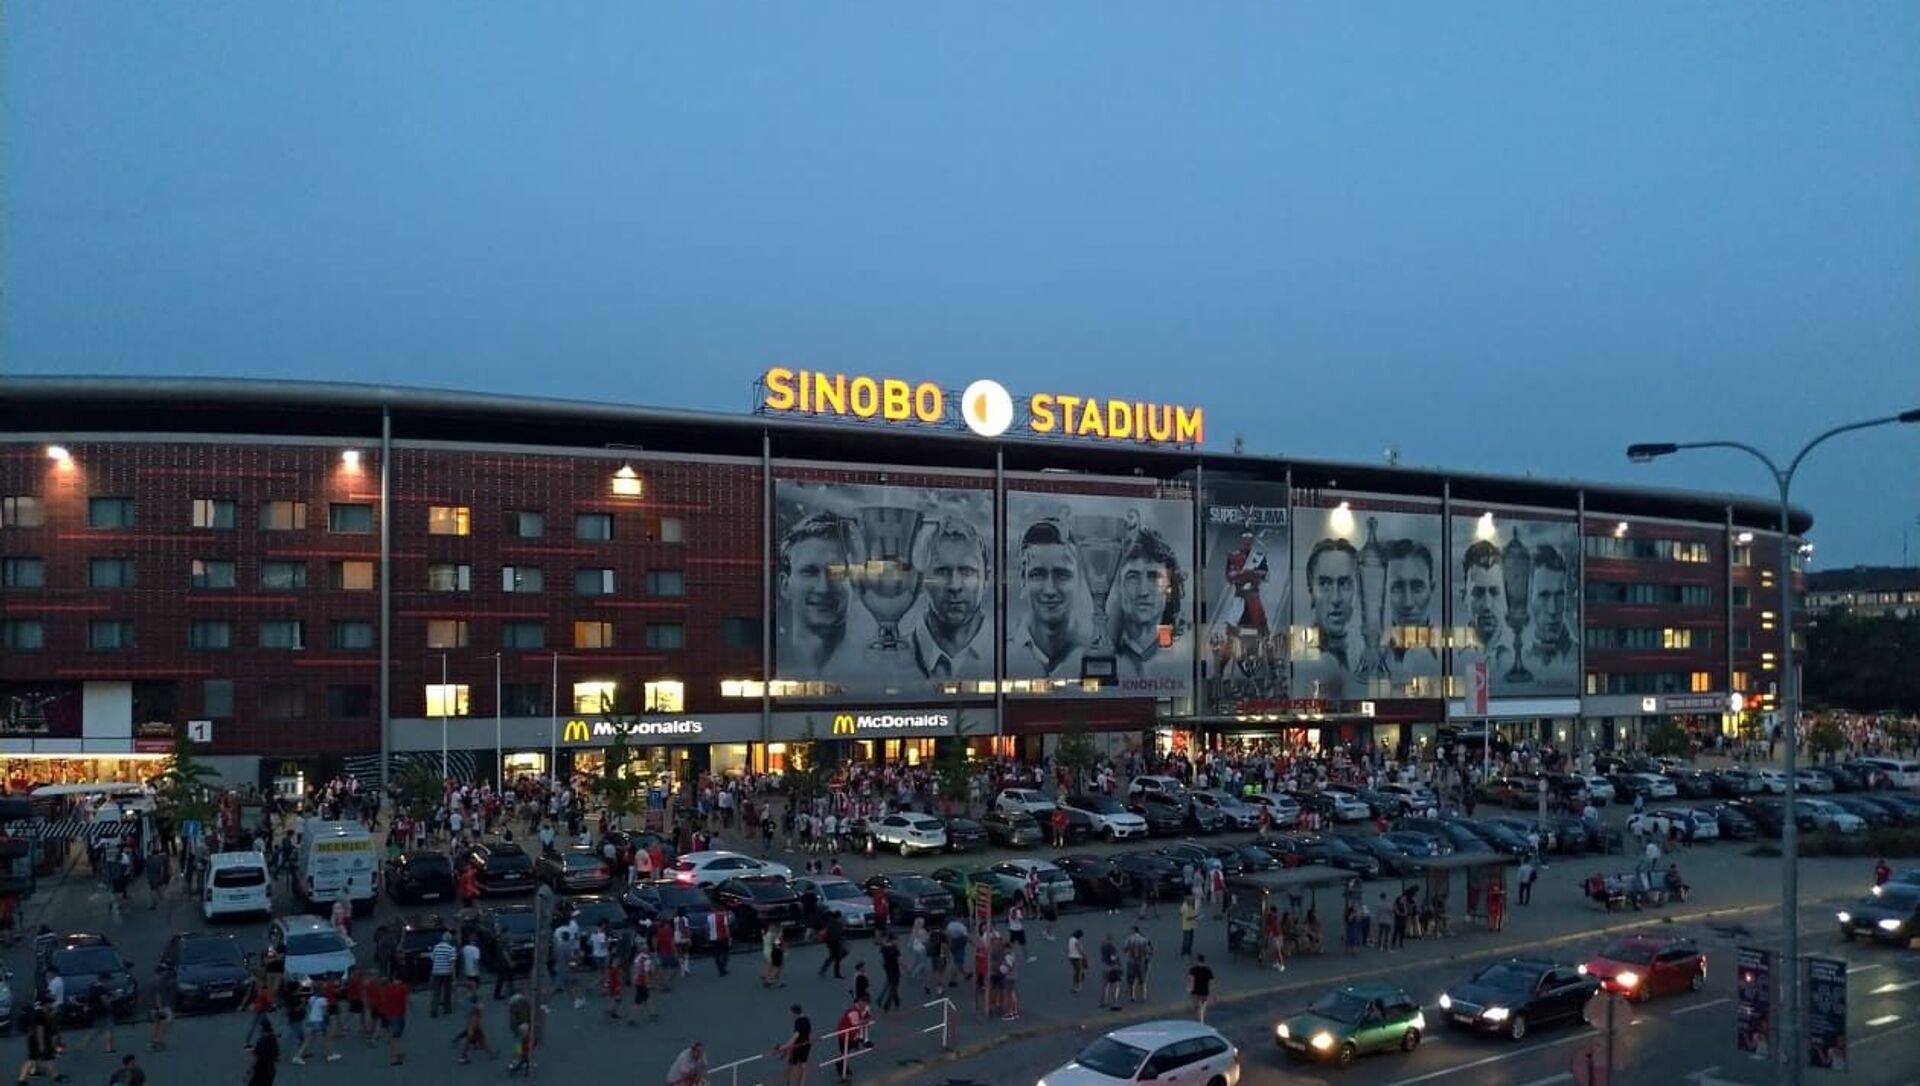 Sinobo Stadium v Praze - Sputnik Česká republika, 1920, 19.03.2021